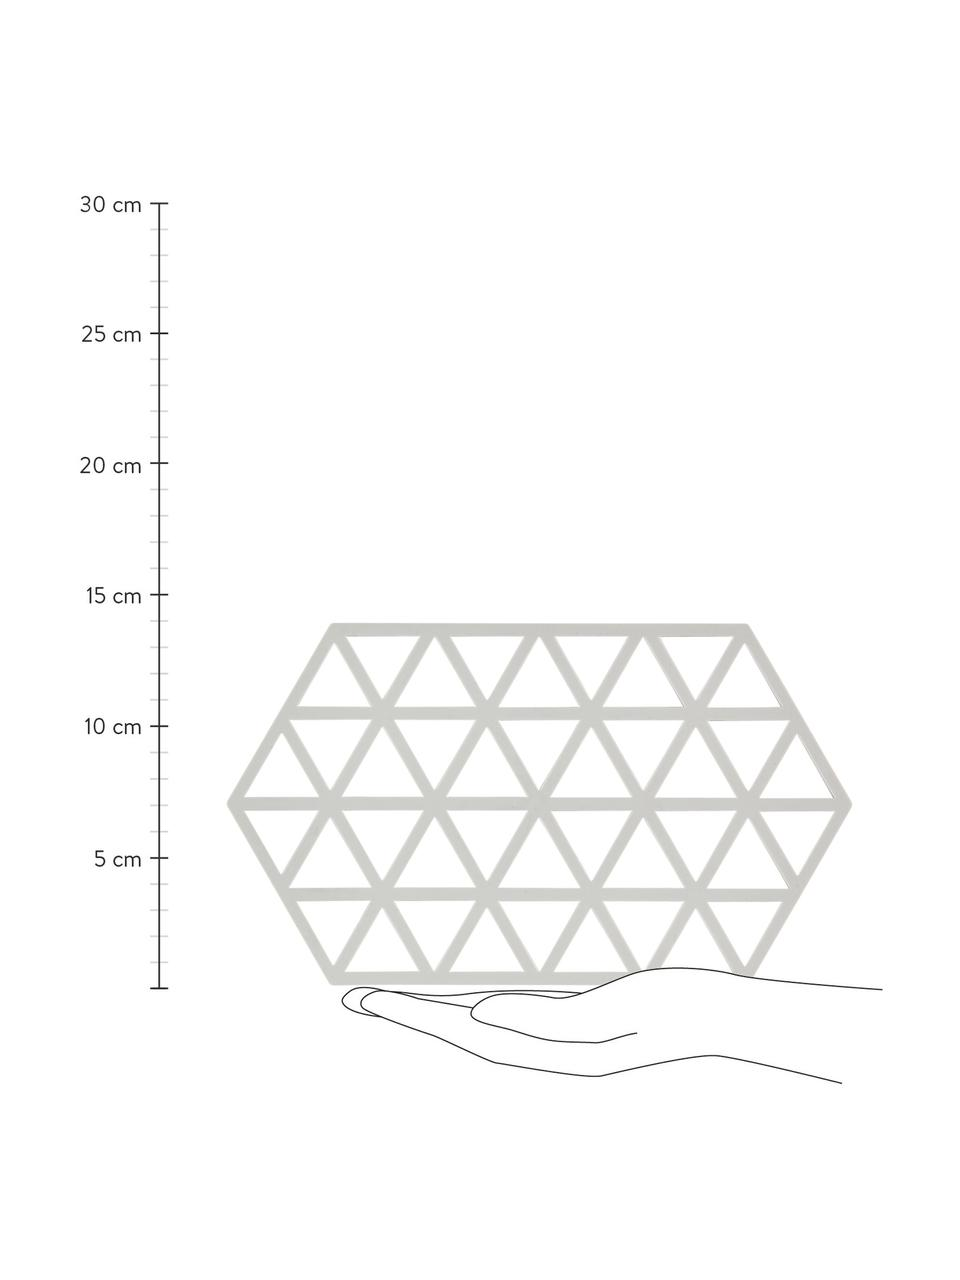 Silikon Topfuntersetzer Triangle in Hellgrau, Silikon, Hellgrau, 14 x 24 cm